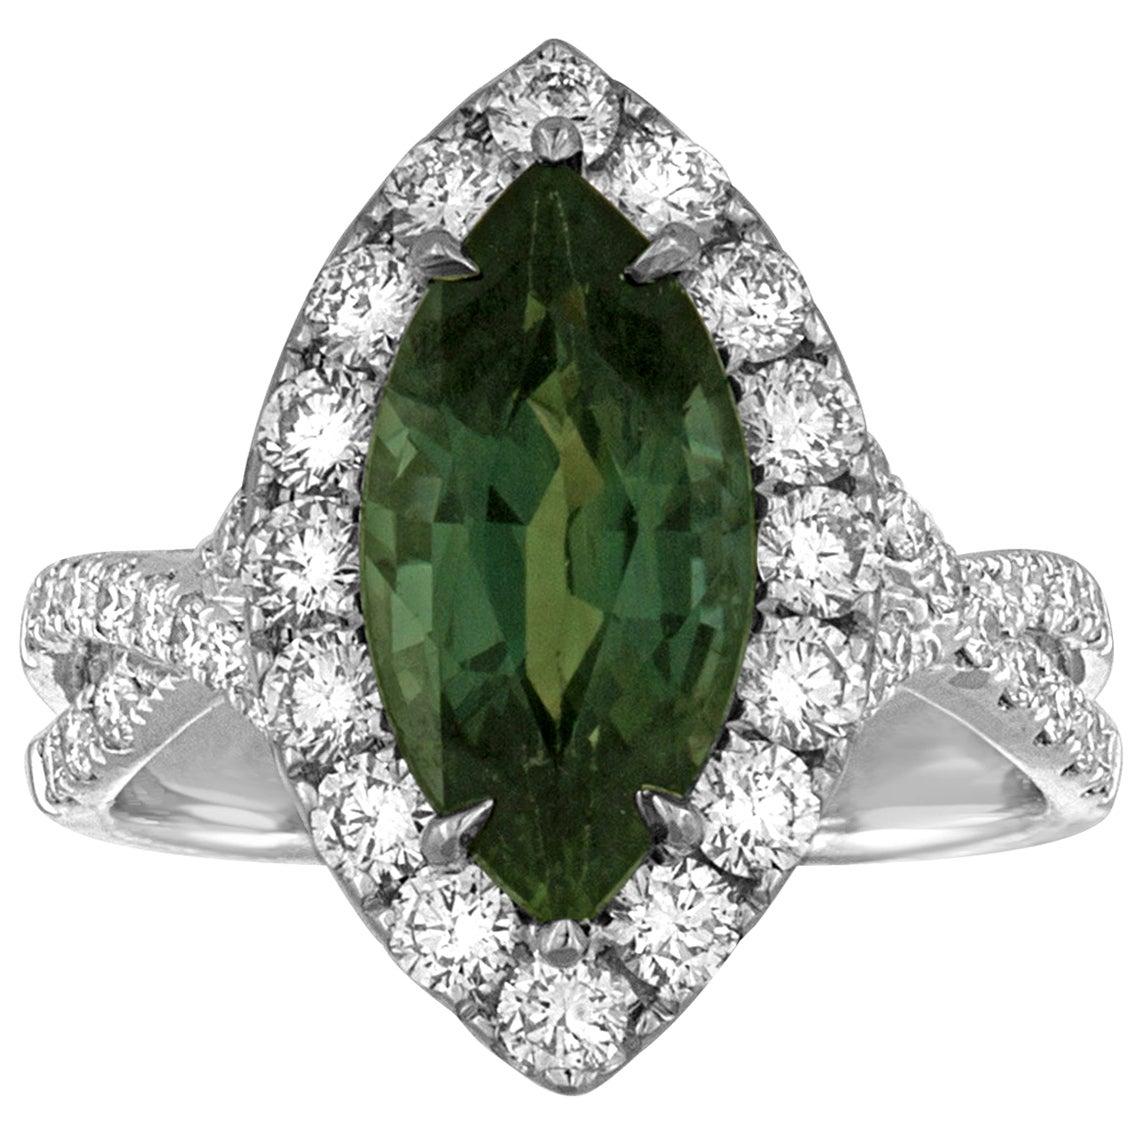 Certified 3.87 Carat No Heat Marquise Blue Green Sapphire Diamond Gold Ring